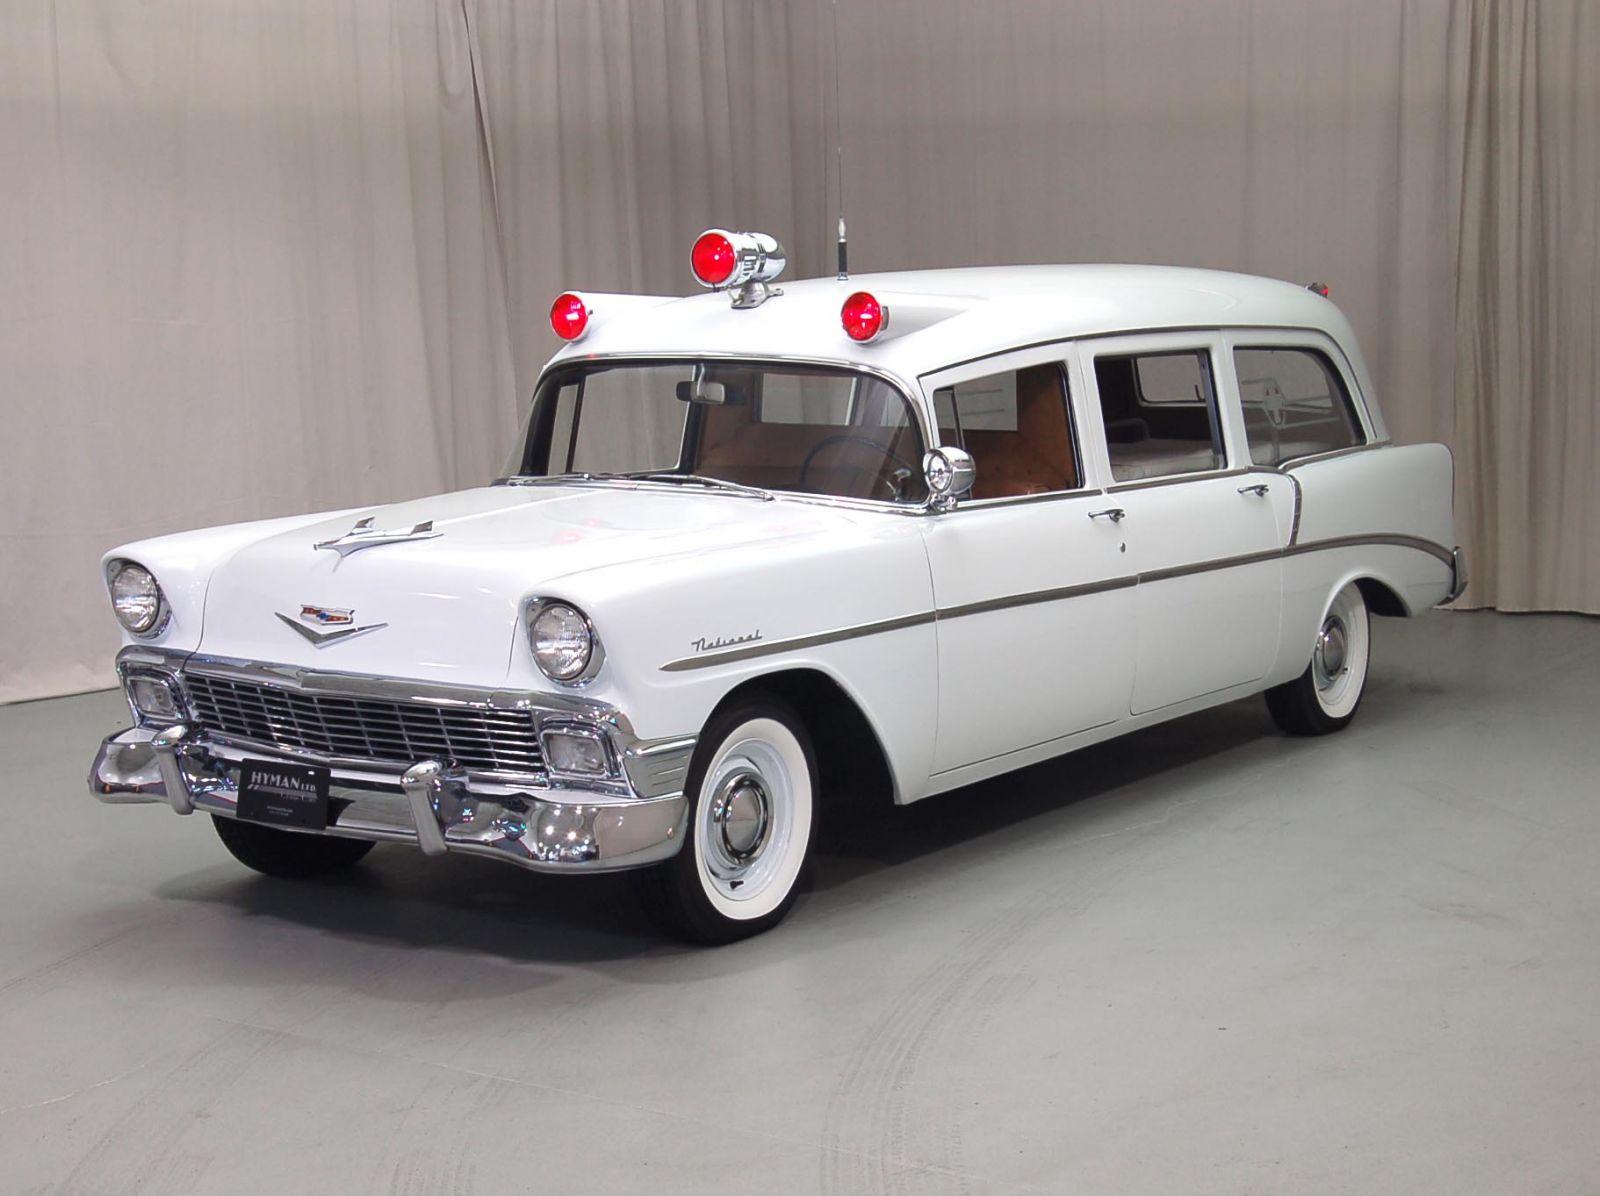 1956 Chevrolet Ambulance | Hyman Ltd. Classic Cars